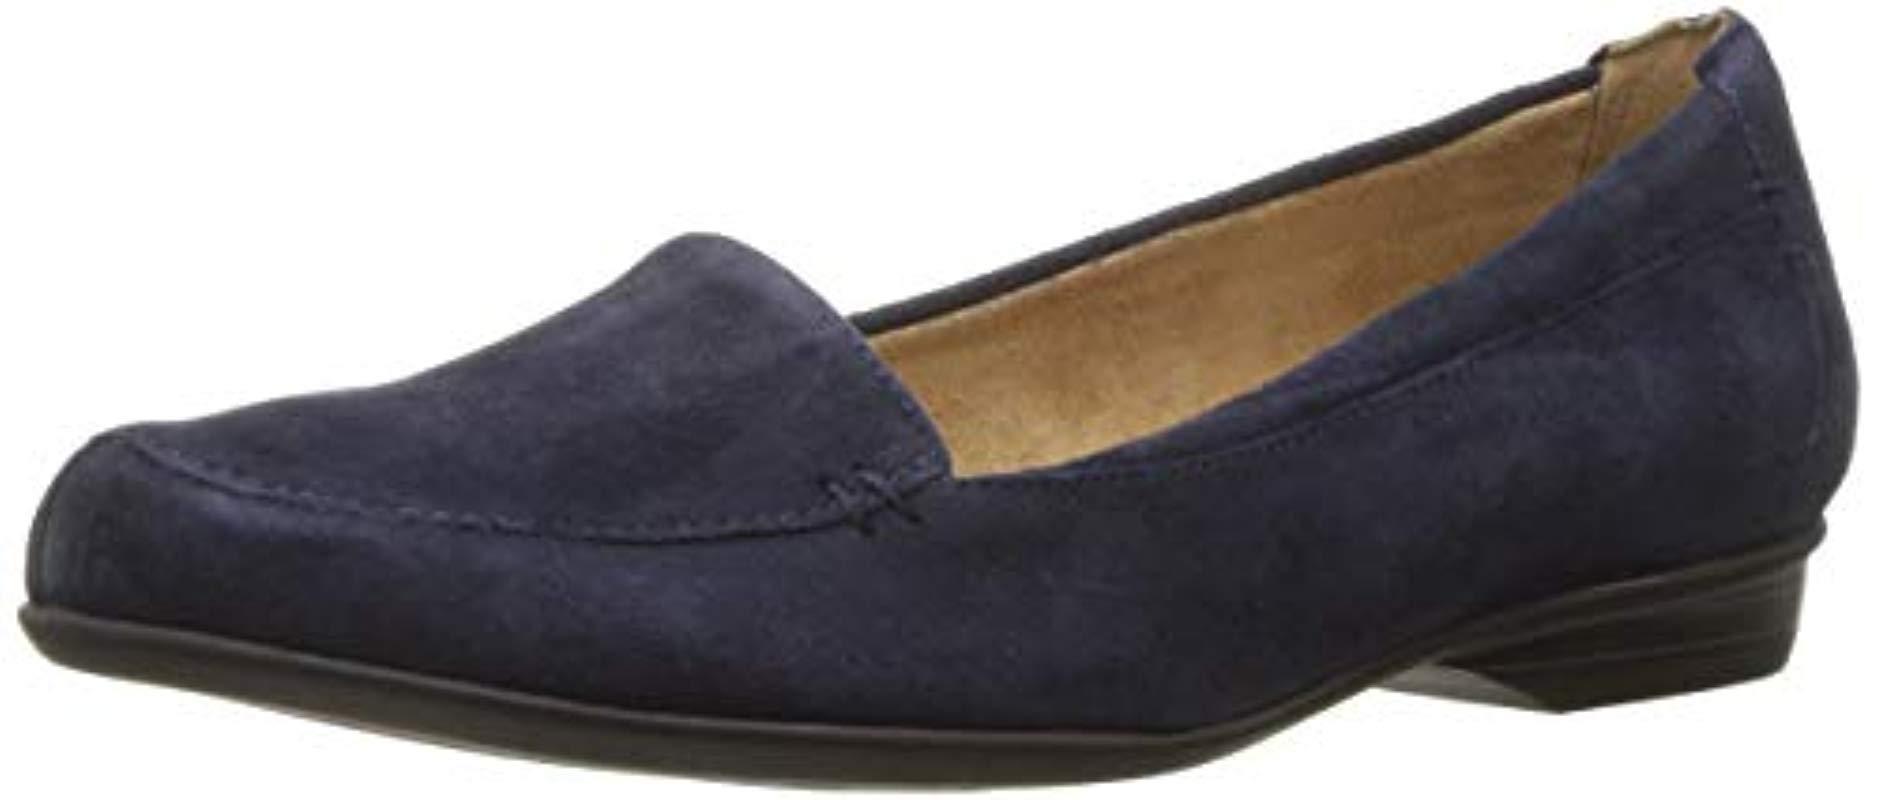 2e18042ba03 Naturalizer. Women s Blue Saban Loafer ...